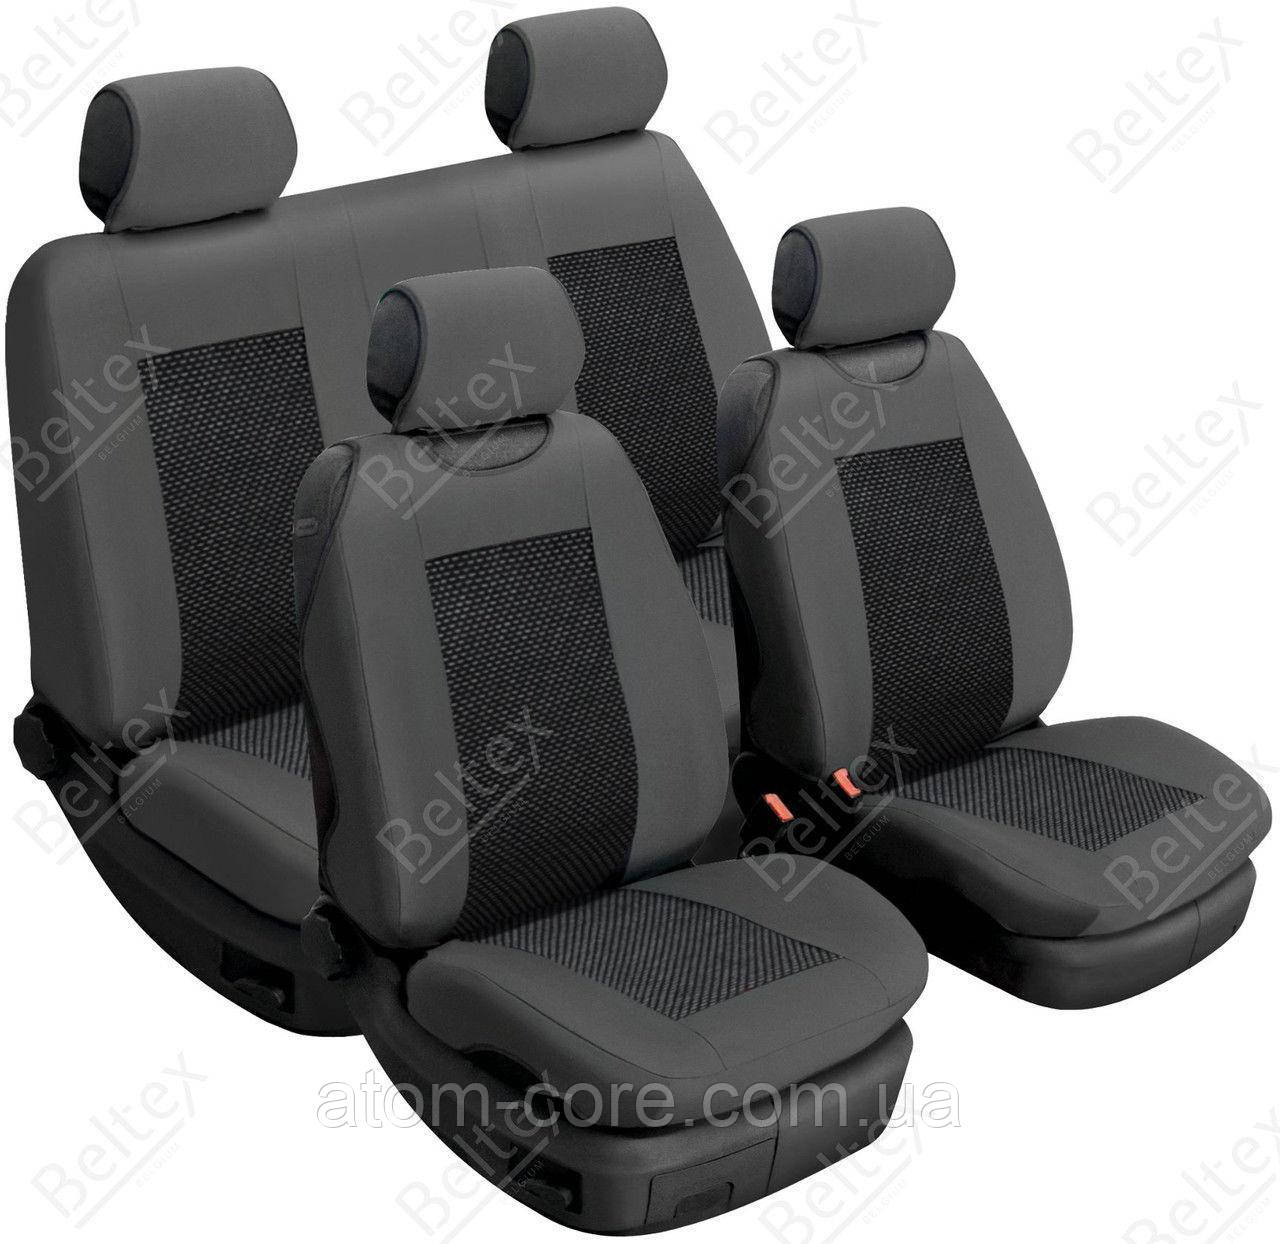 Майки/чехлы на сиденья Митсубиси АСХ (Mitsubishi ASX)